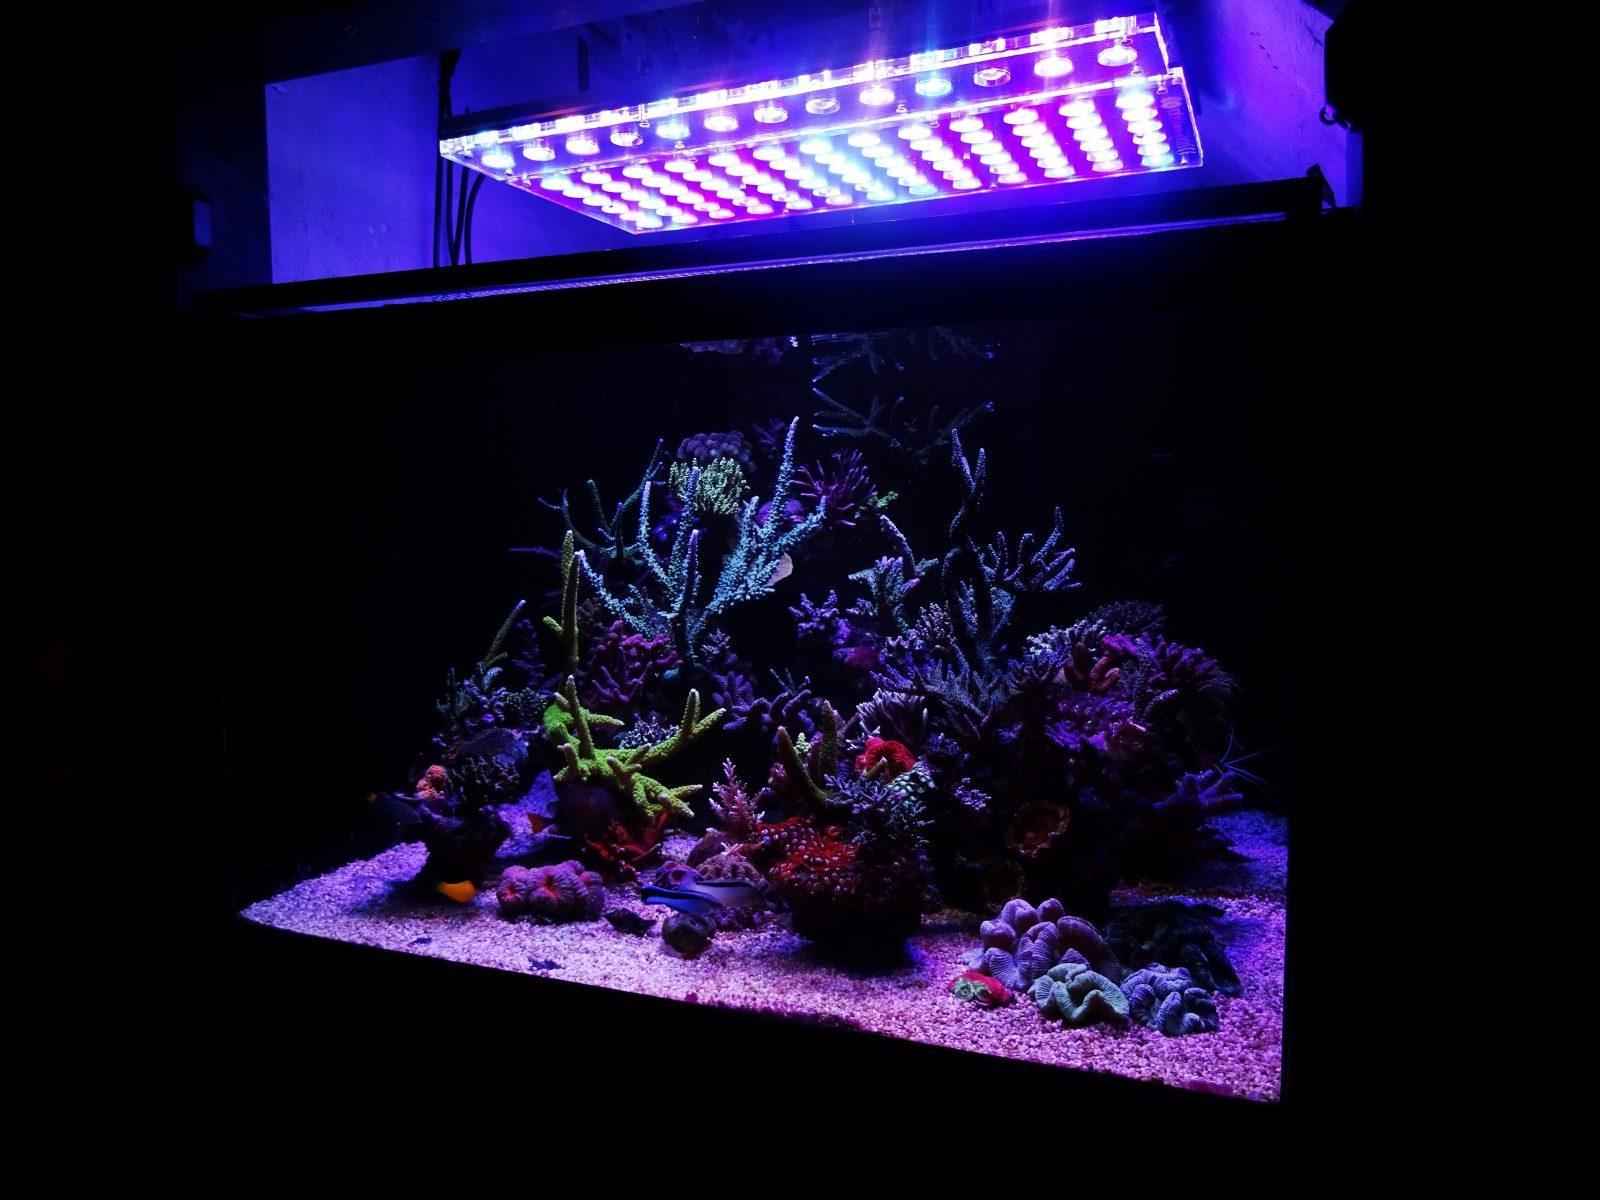 atlantik v4 reef aquarium led beleuchtung orphek aquarium led beleuchtung. Black Bedroom Furniture Sets. Home Design Ideas